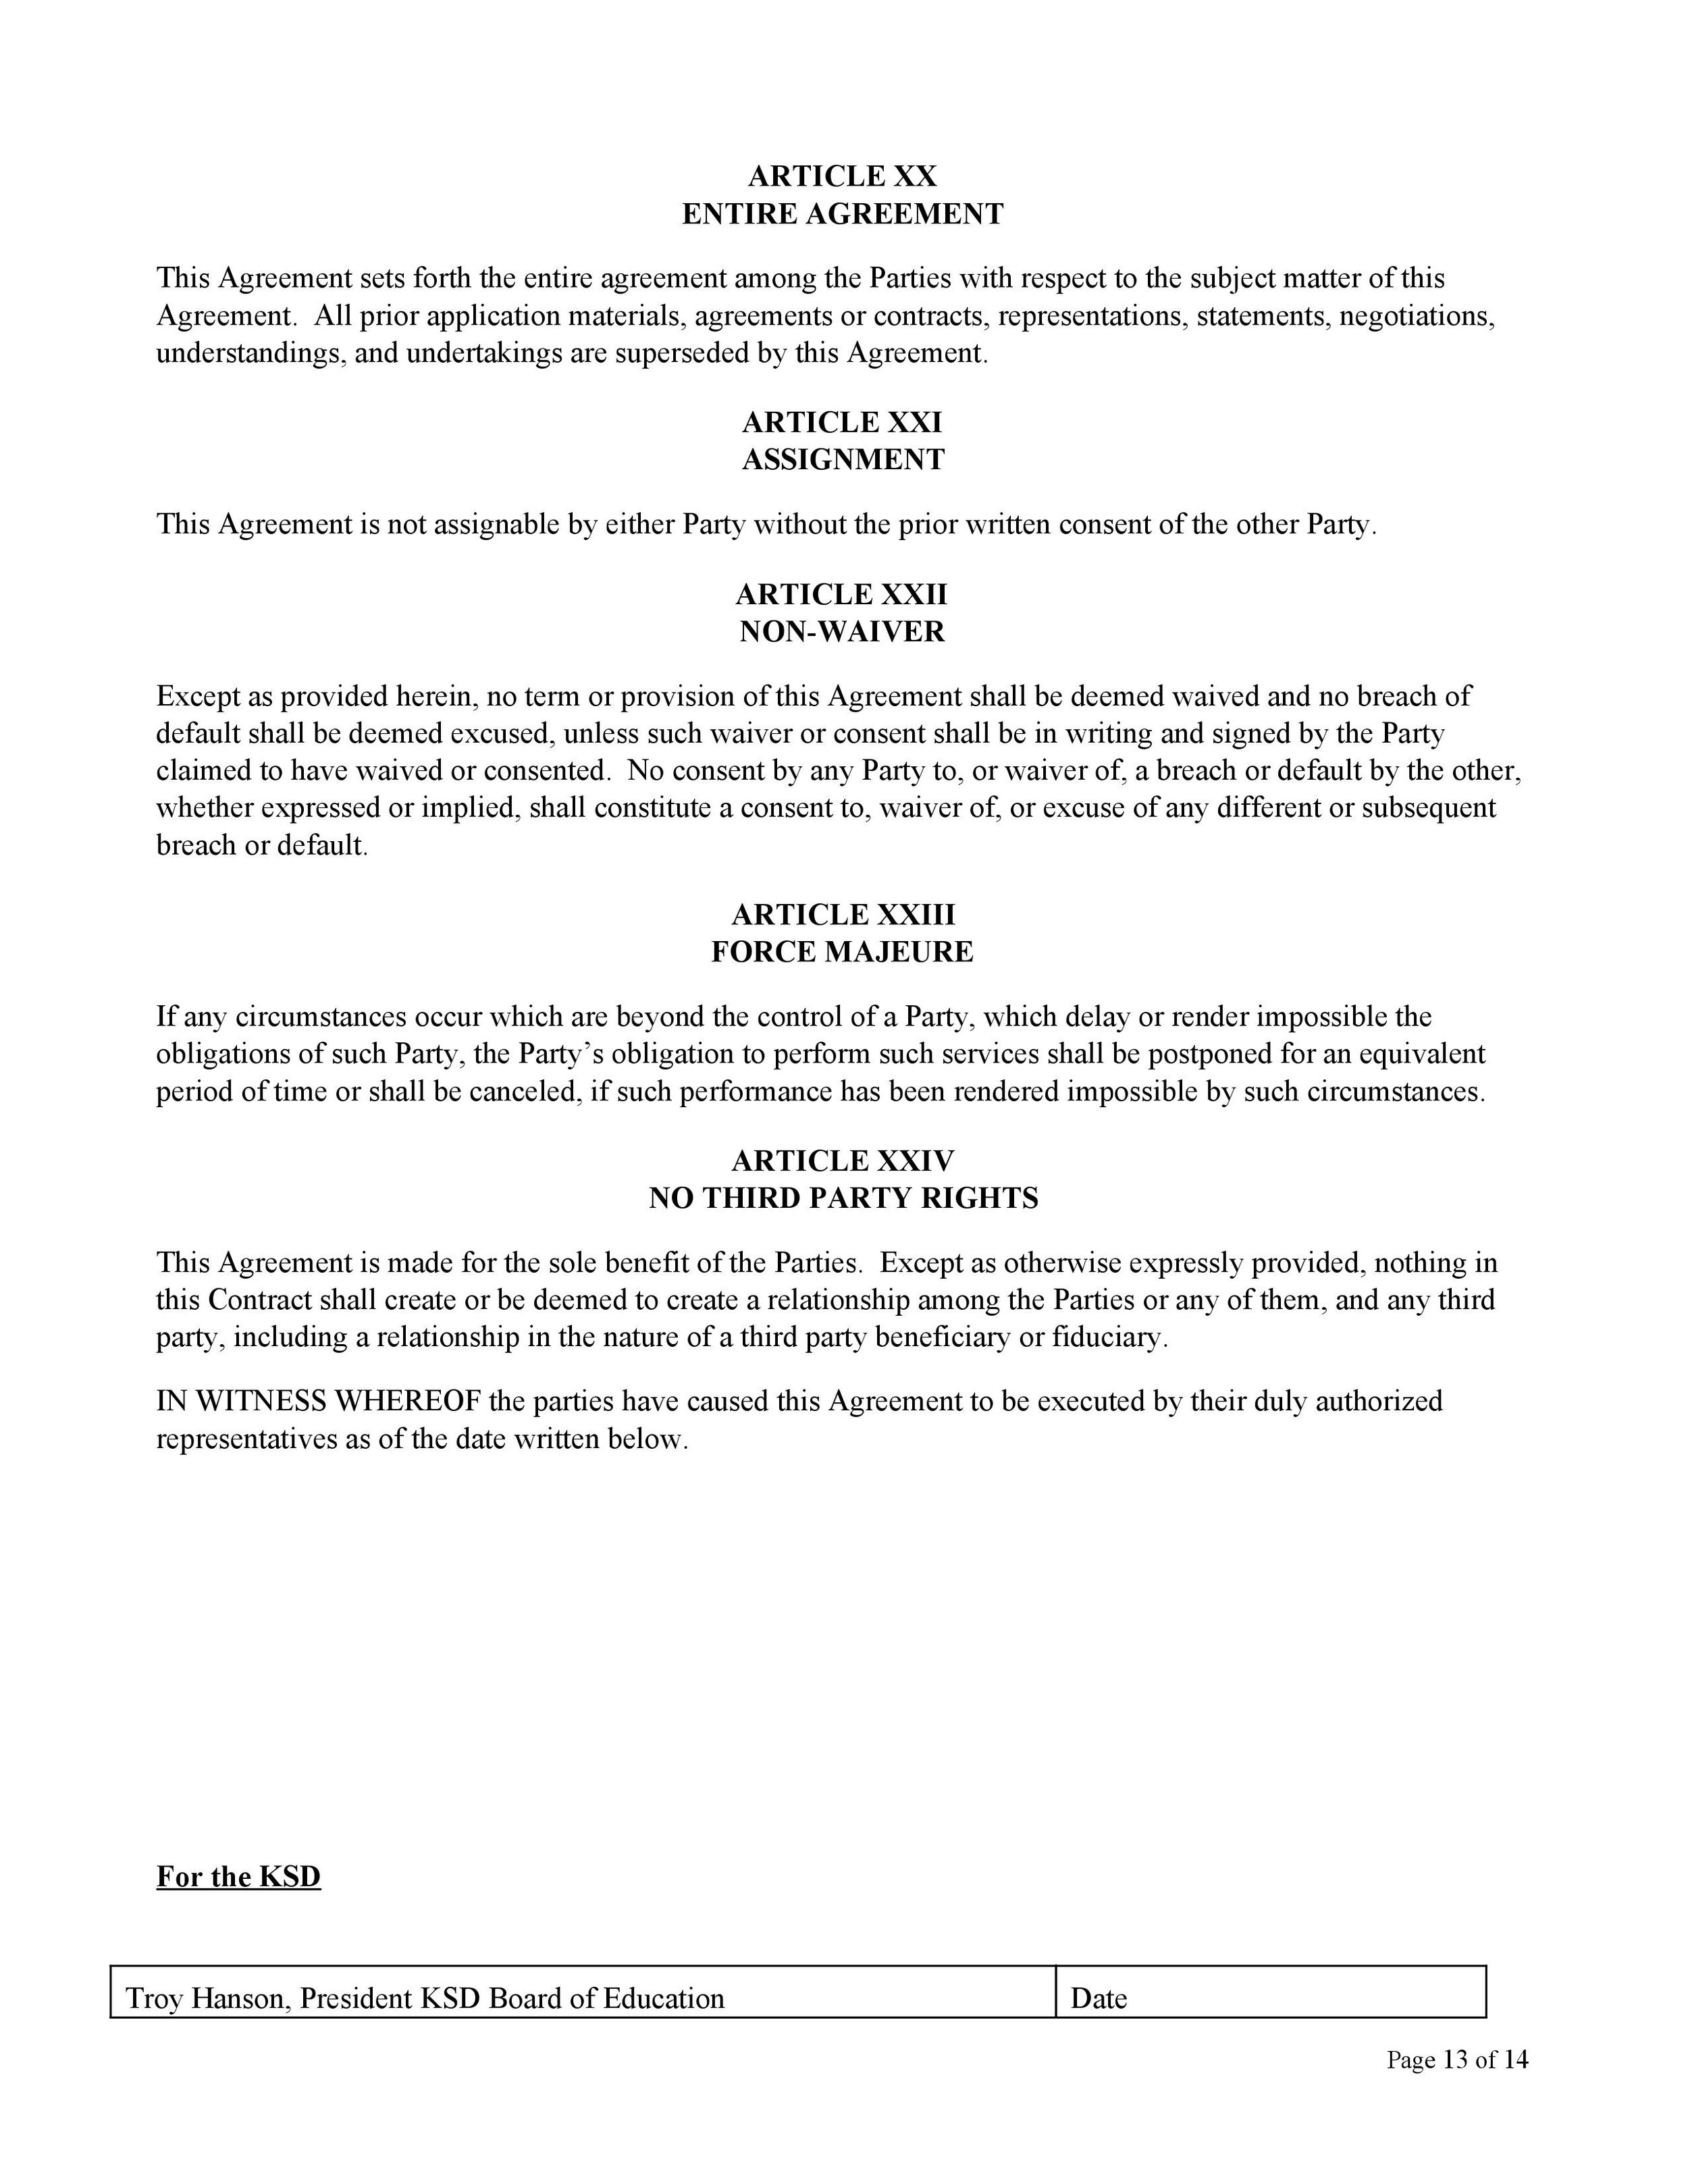 Contract pg 13.jpg